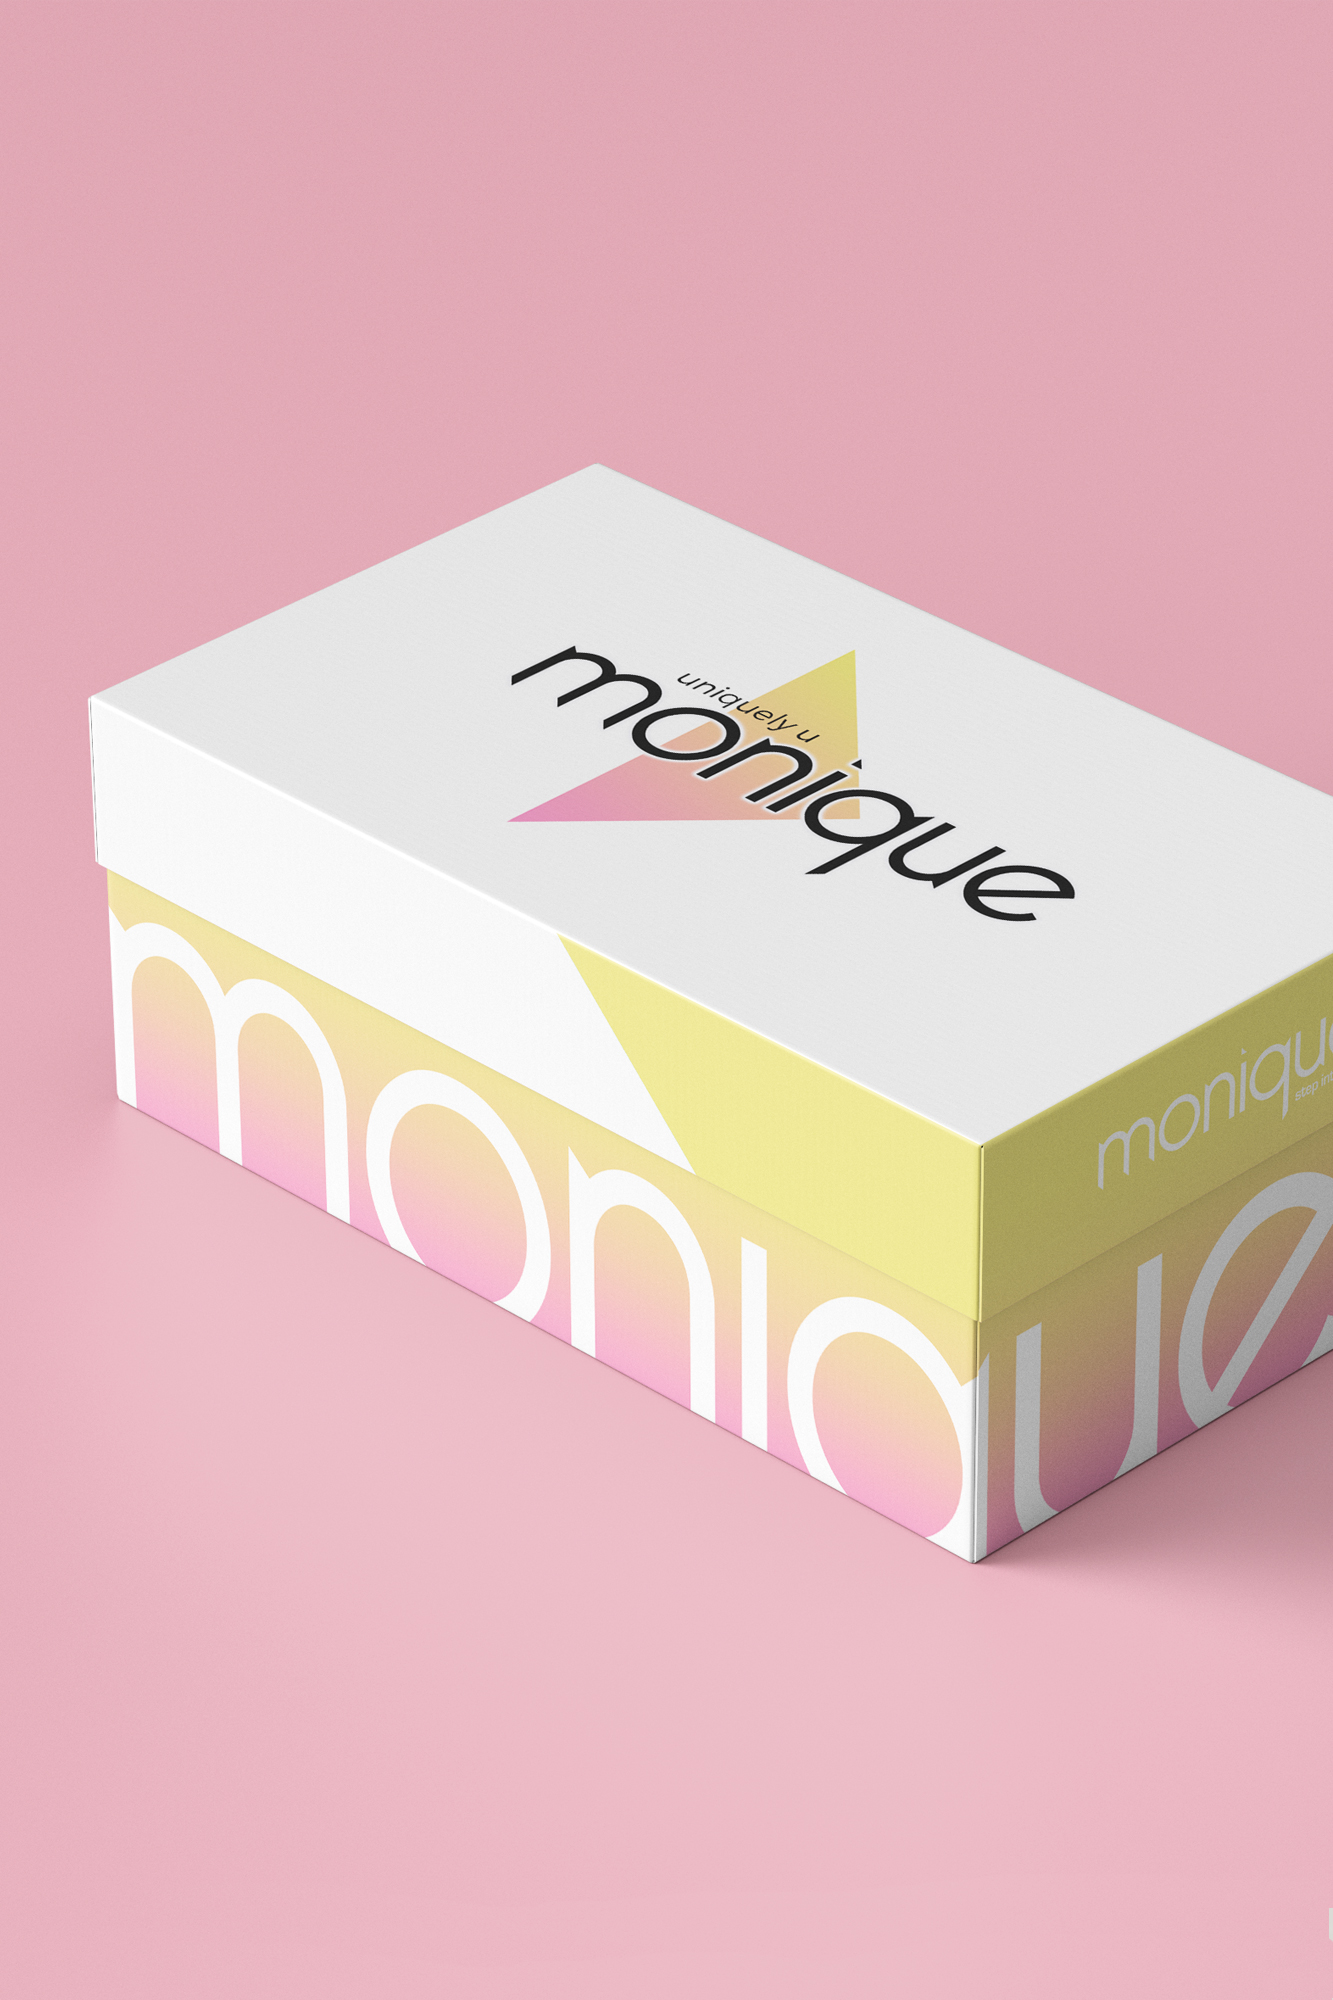 Monique-4v.jpg